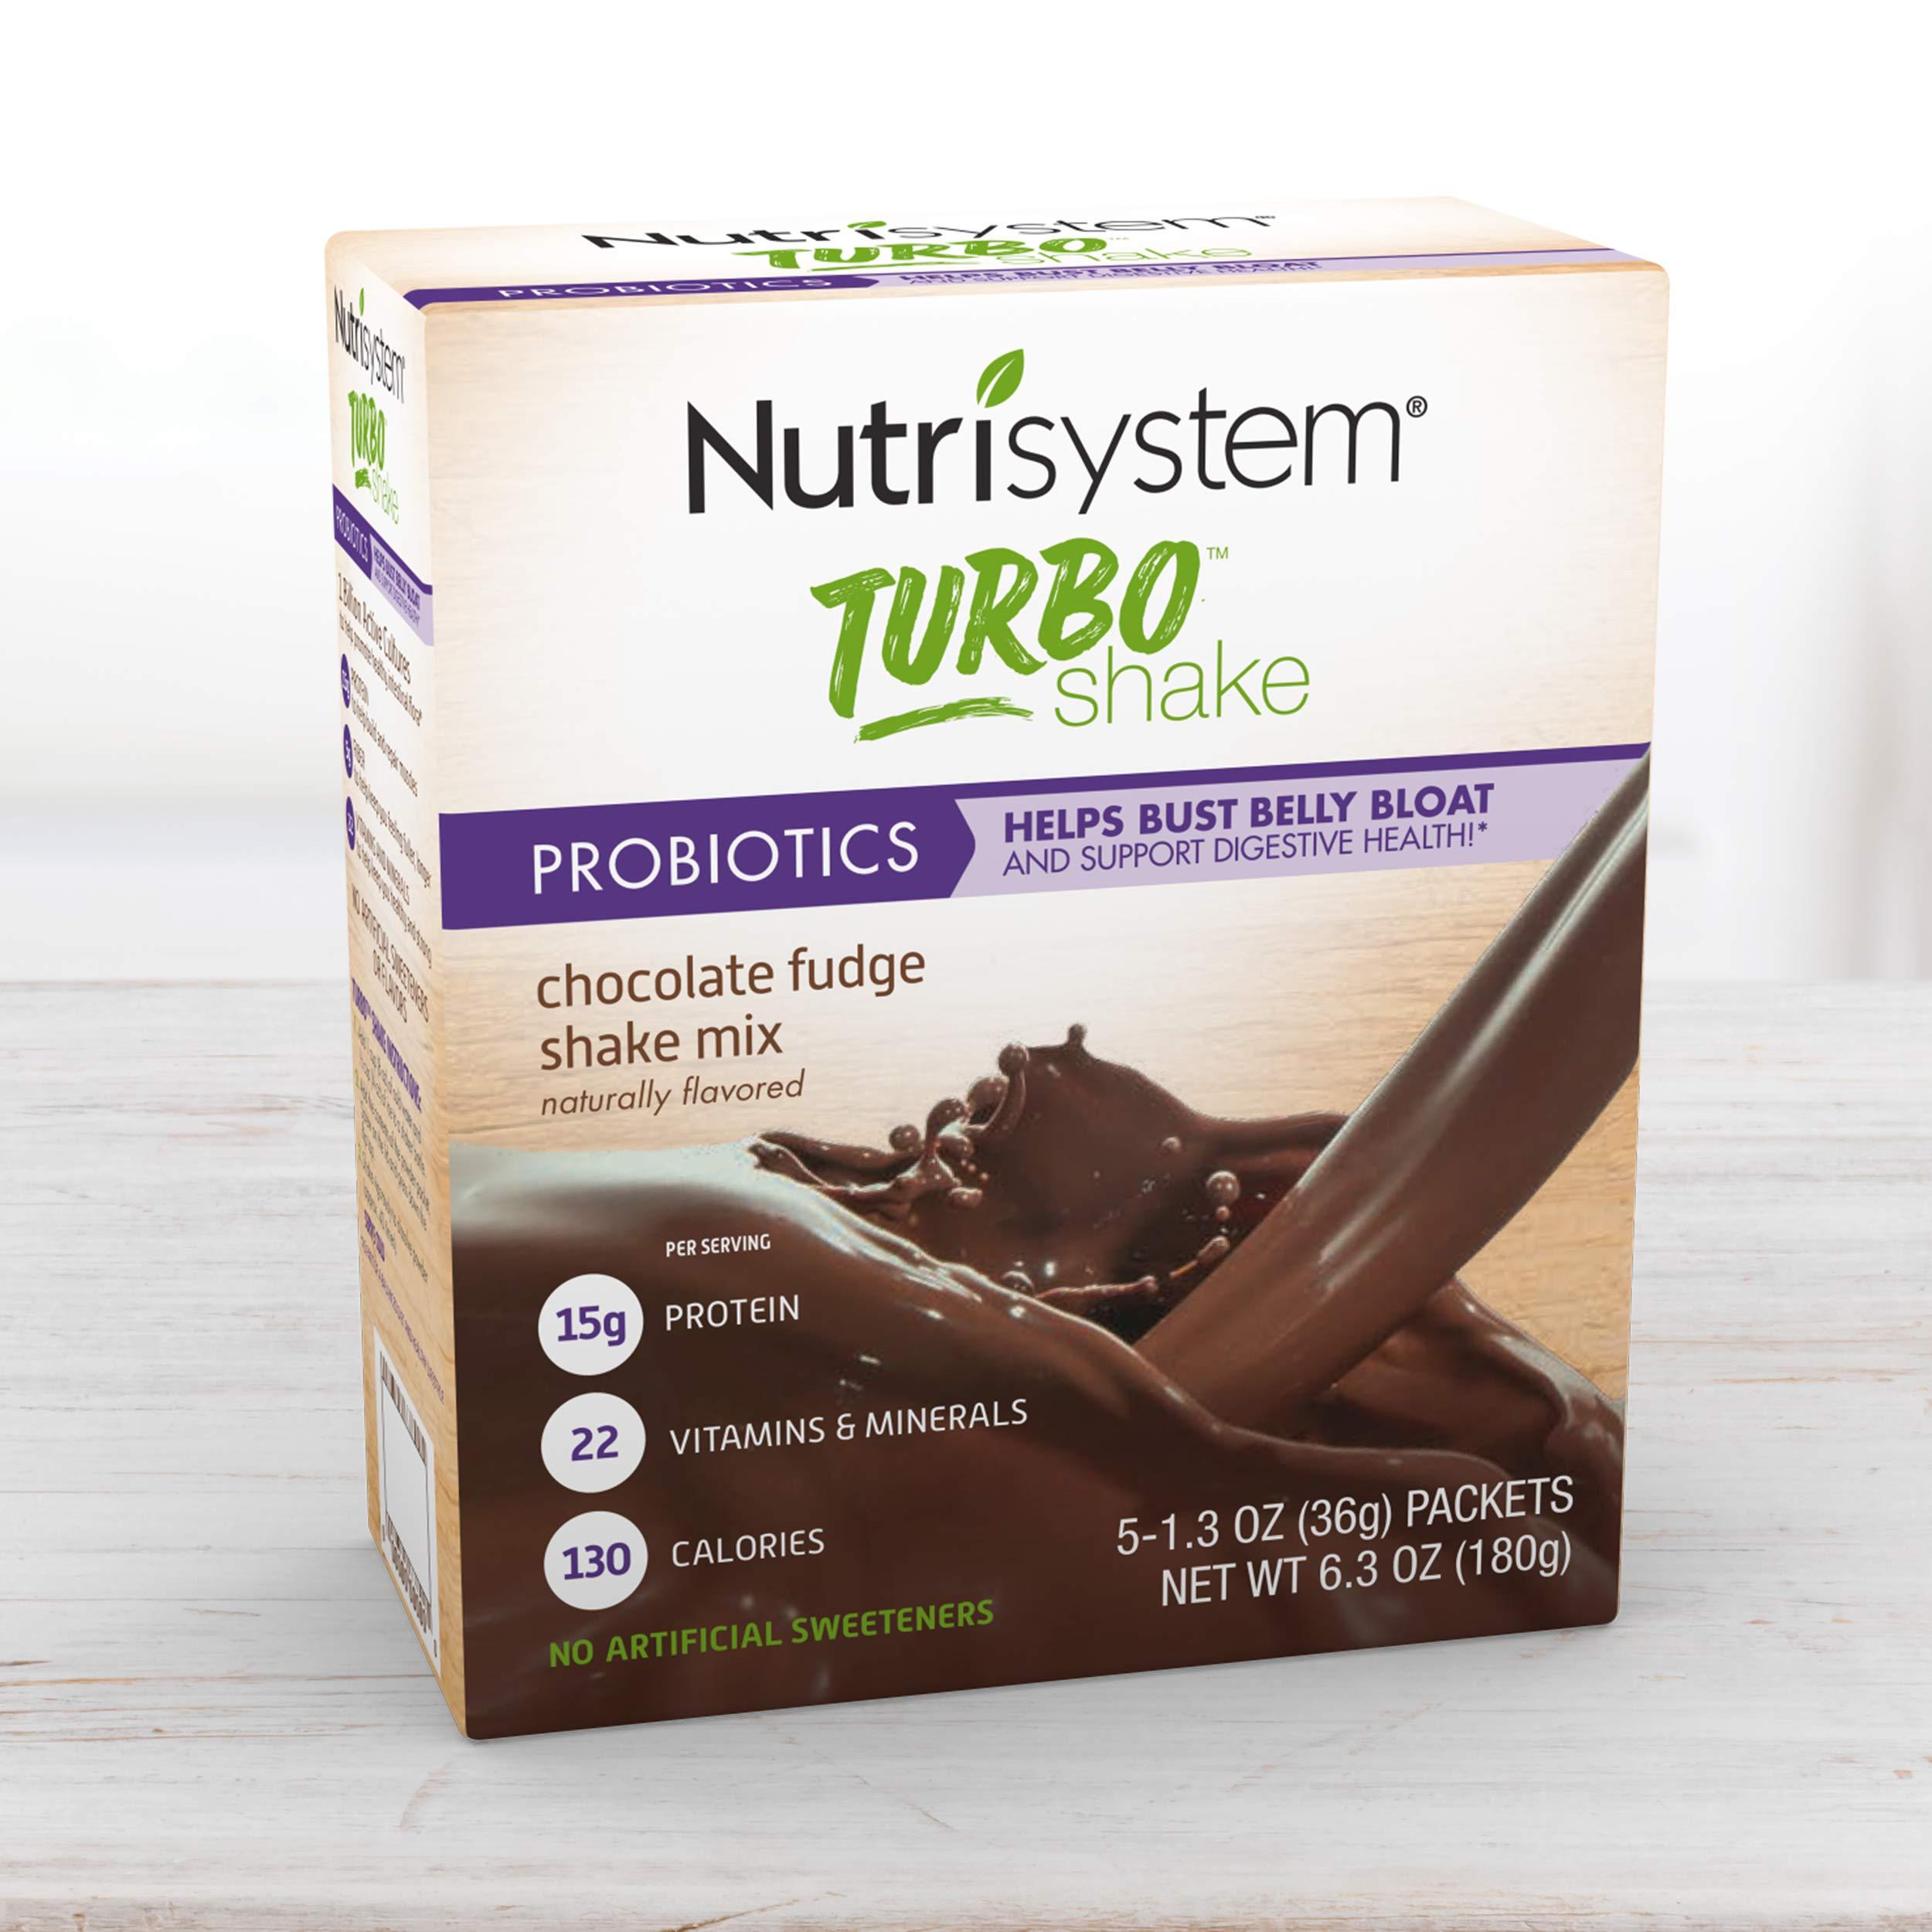 Nutrisystem® Turbo Chocolate Fudge Shake Mix, 20 ct